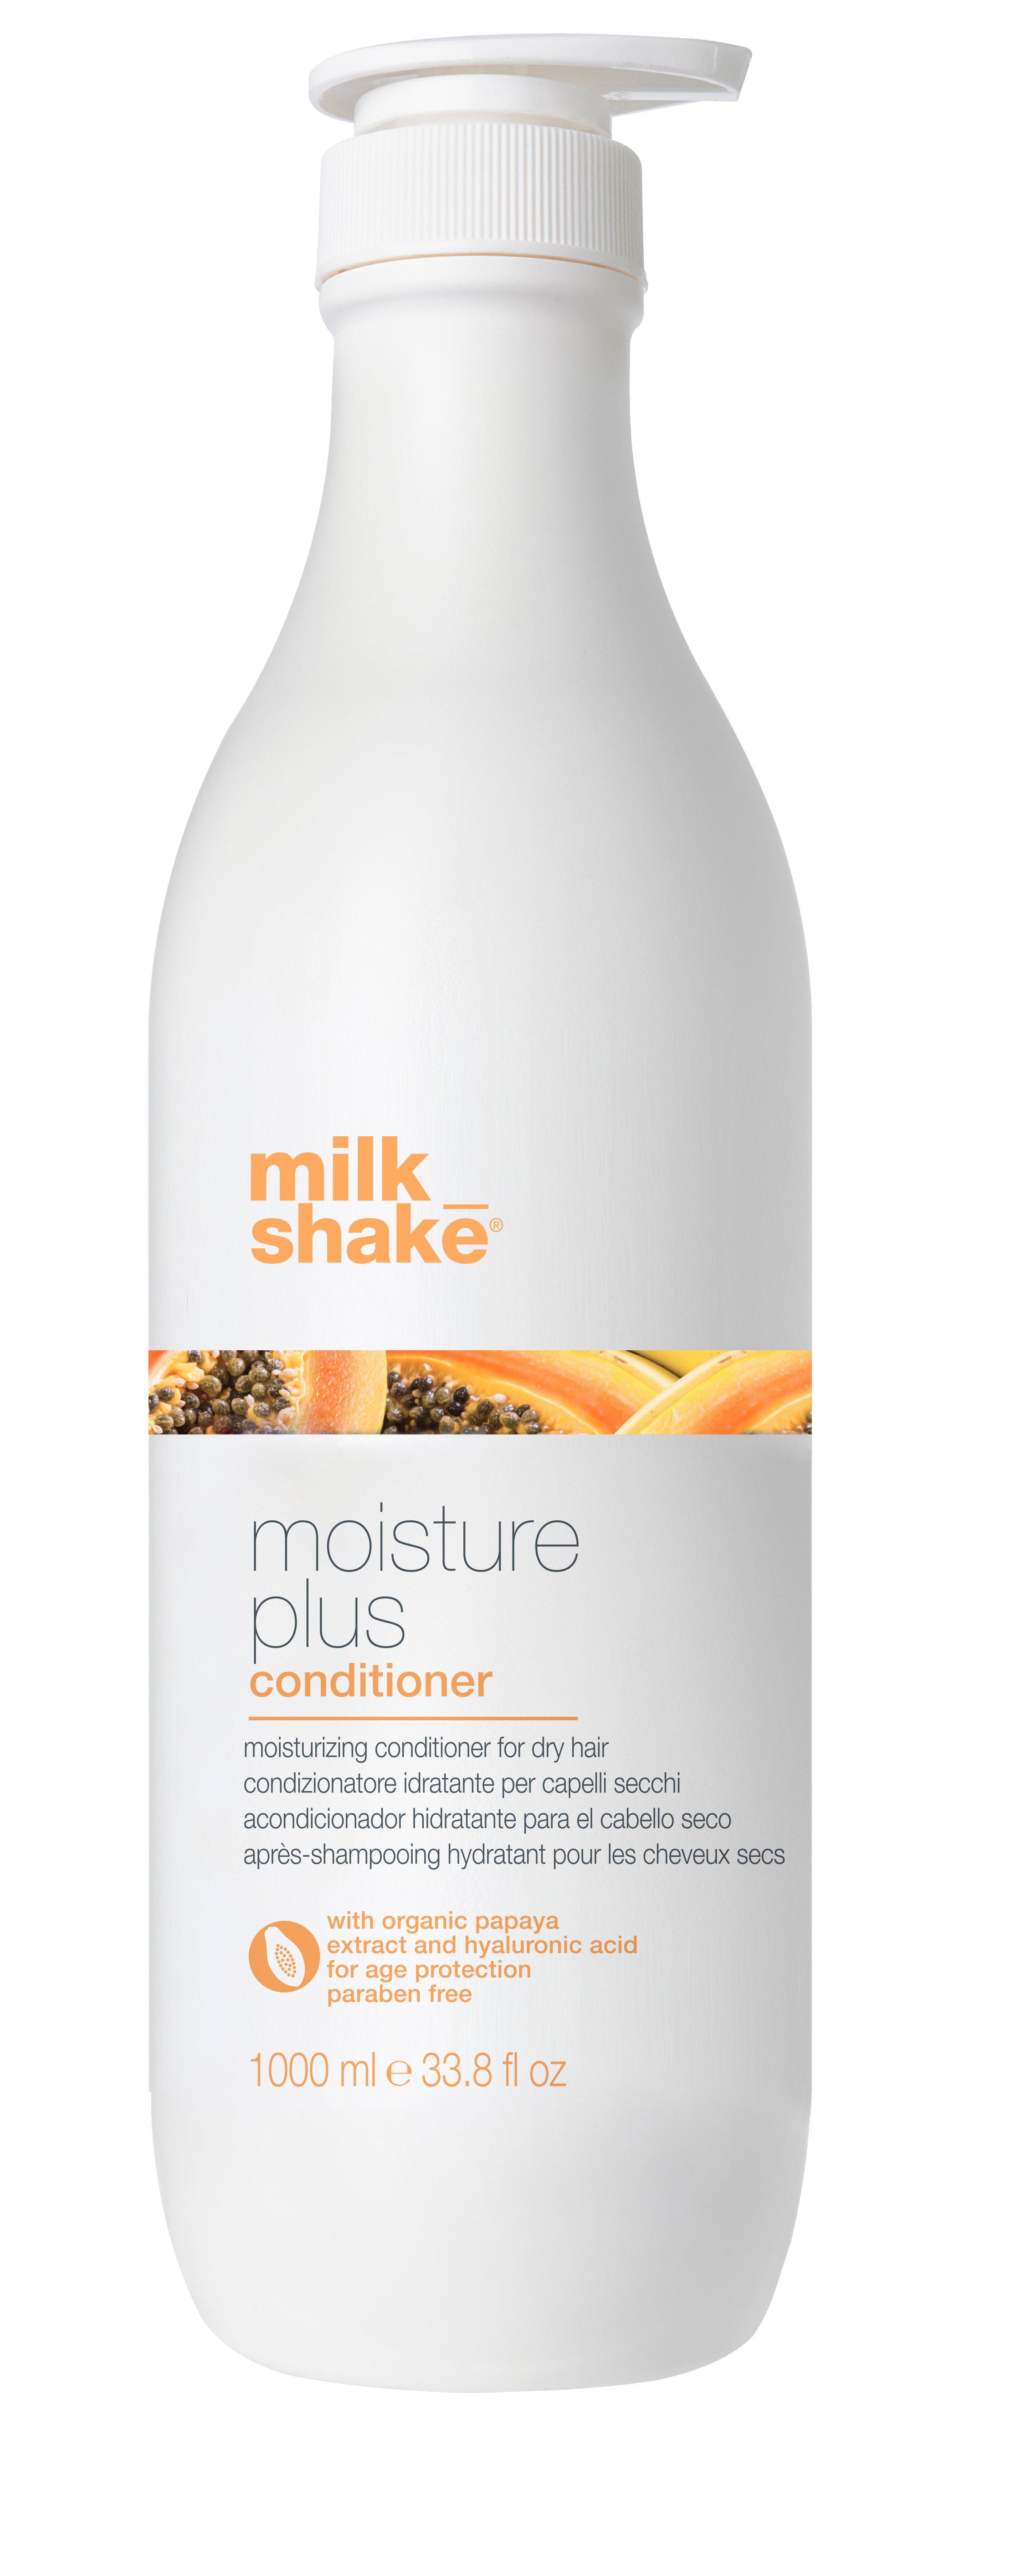 milk_shake - Moisture Plus Conditioner 1000 ml